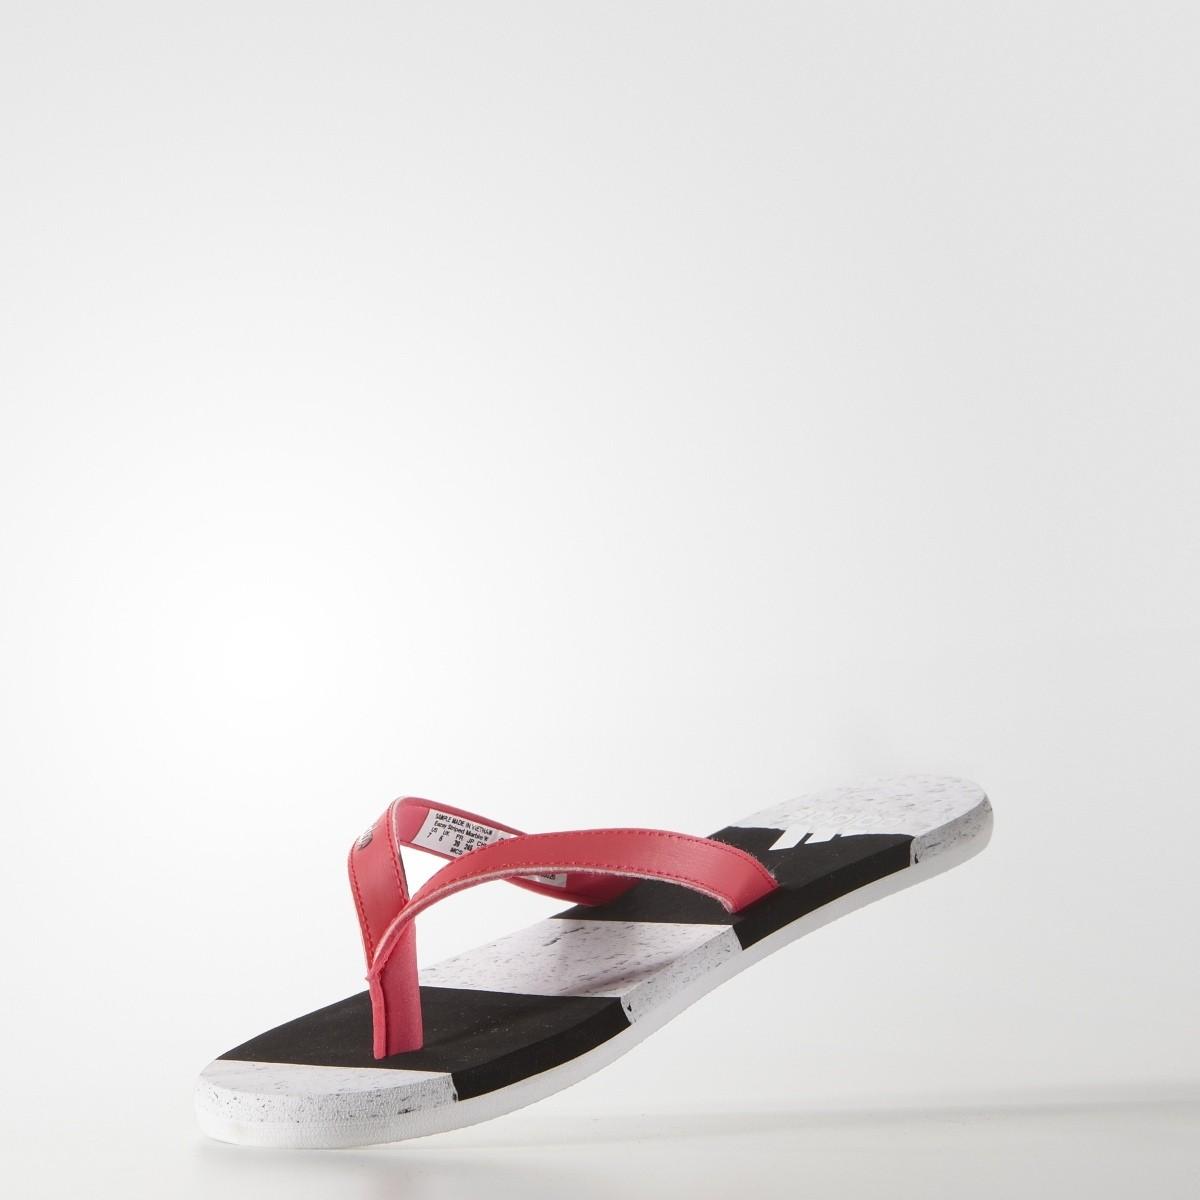 4cae017f1e4 Dámské žabky adidas Performance eezay striped marble W CBLACK FTWWHT SHORED.  1